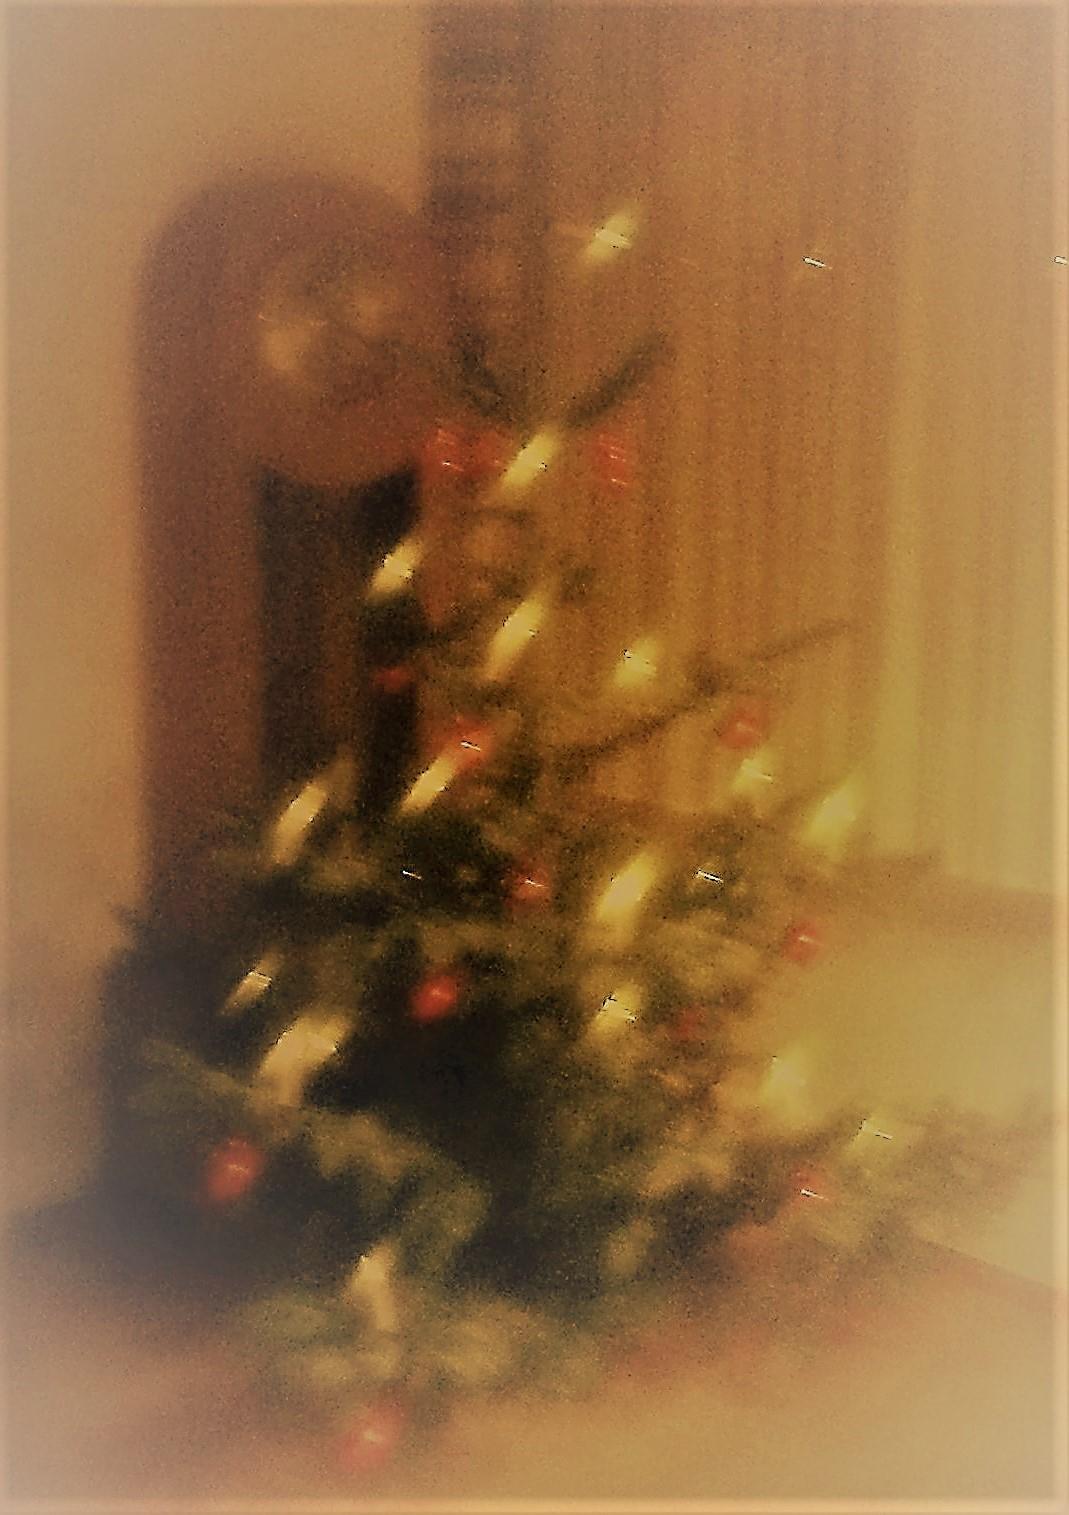 Foto_Weihnachten_(c) Simon Haasis